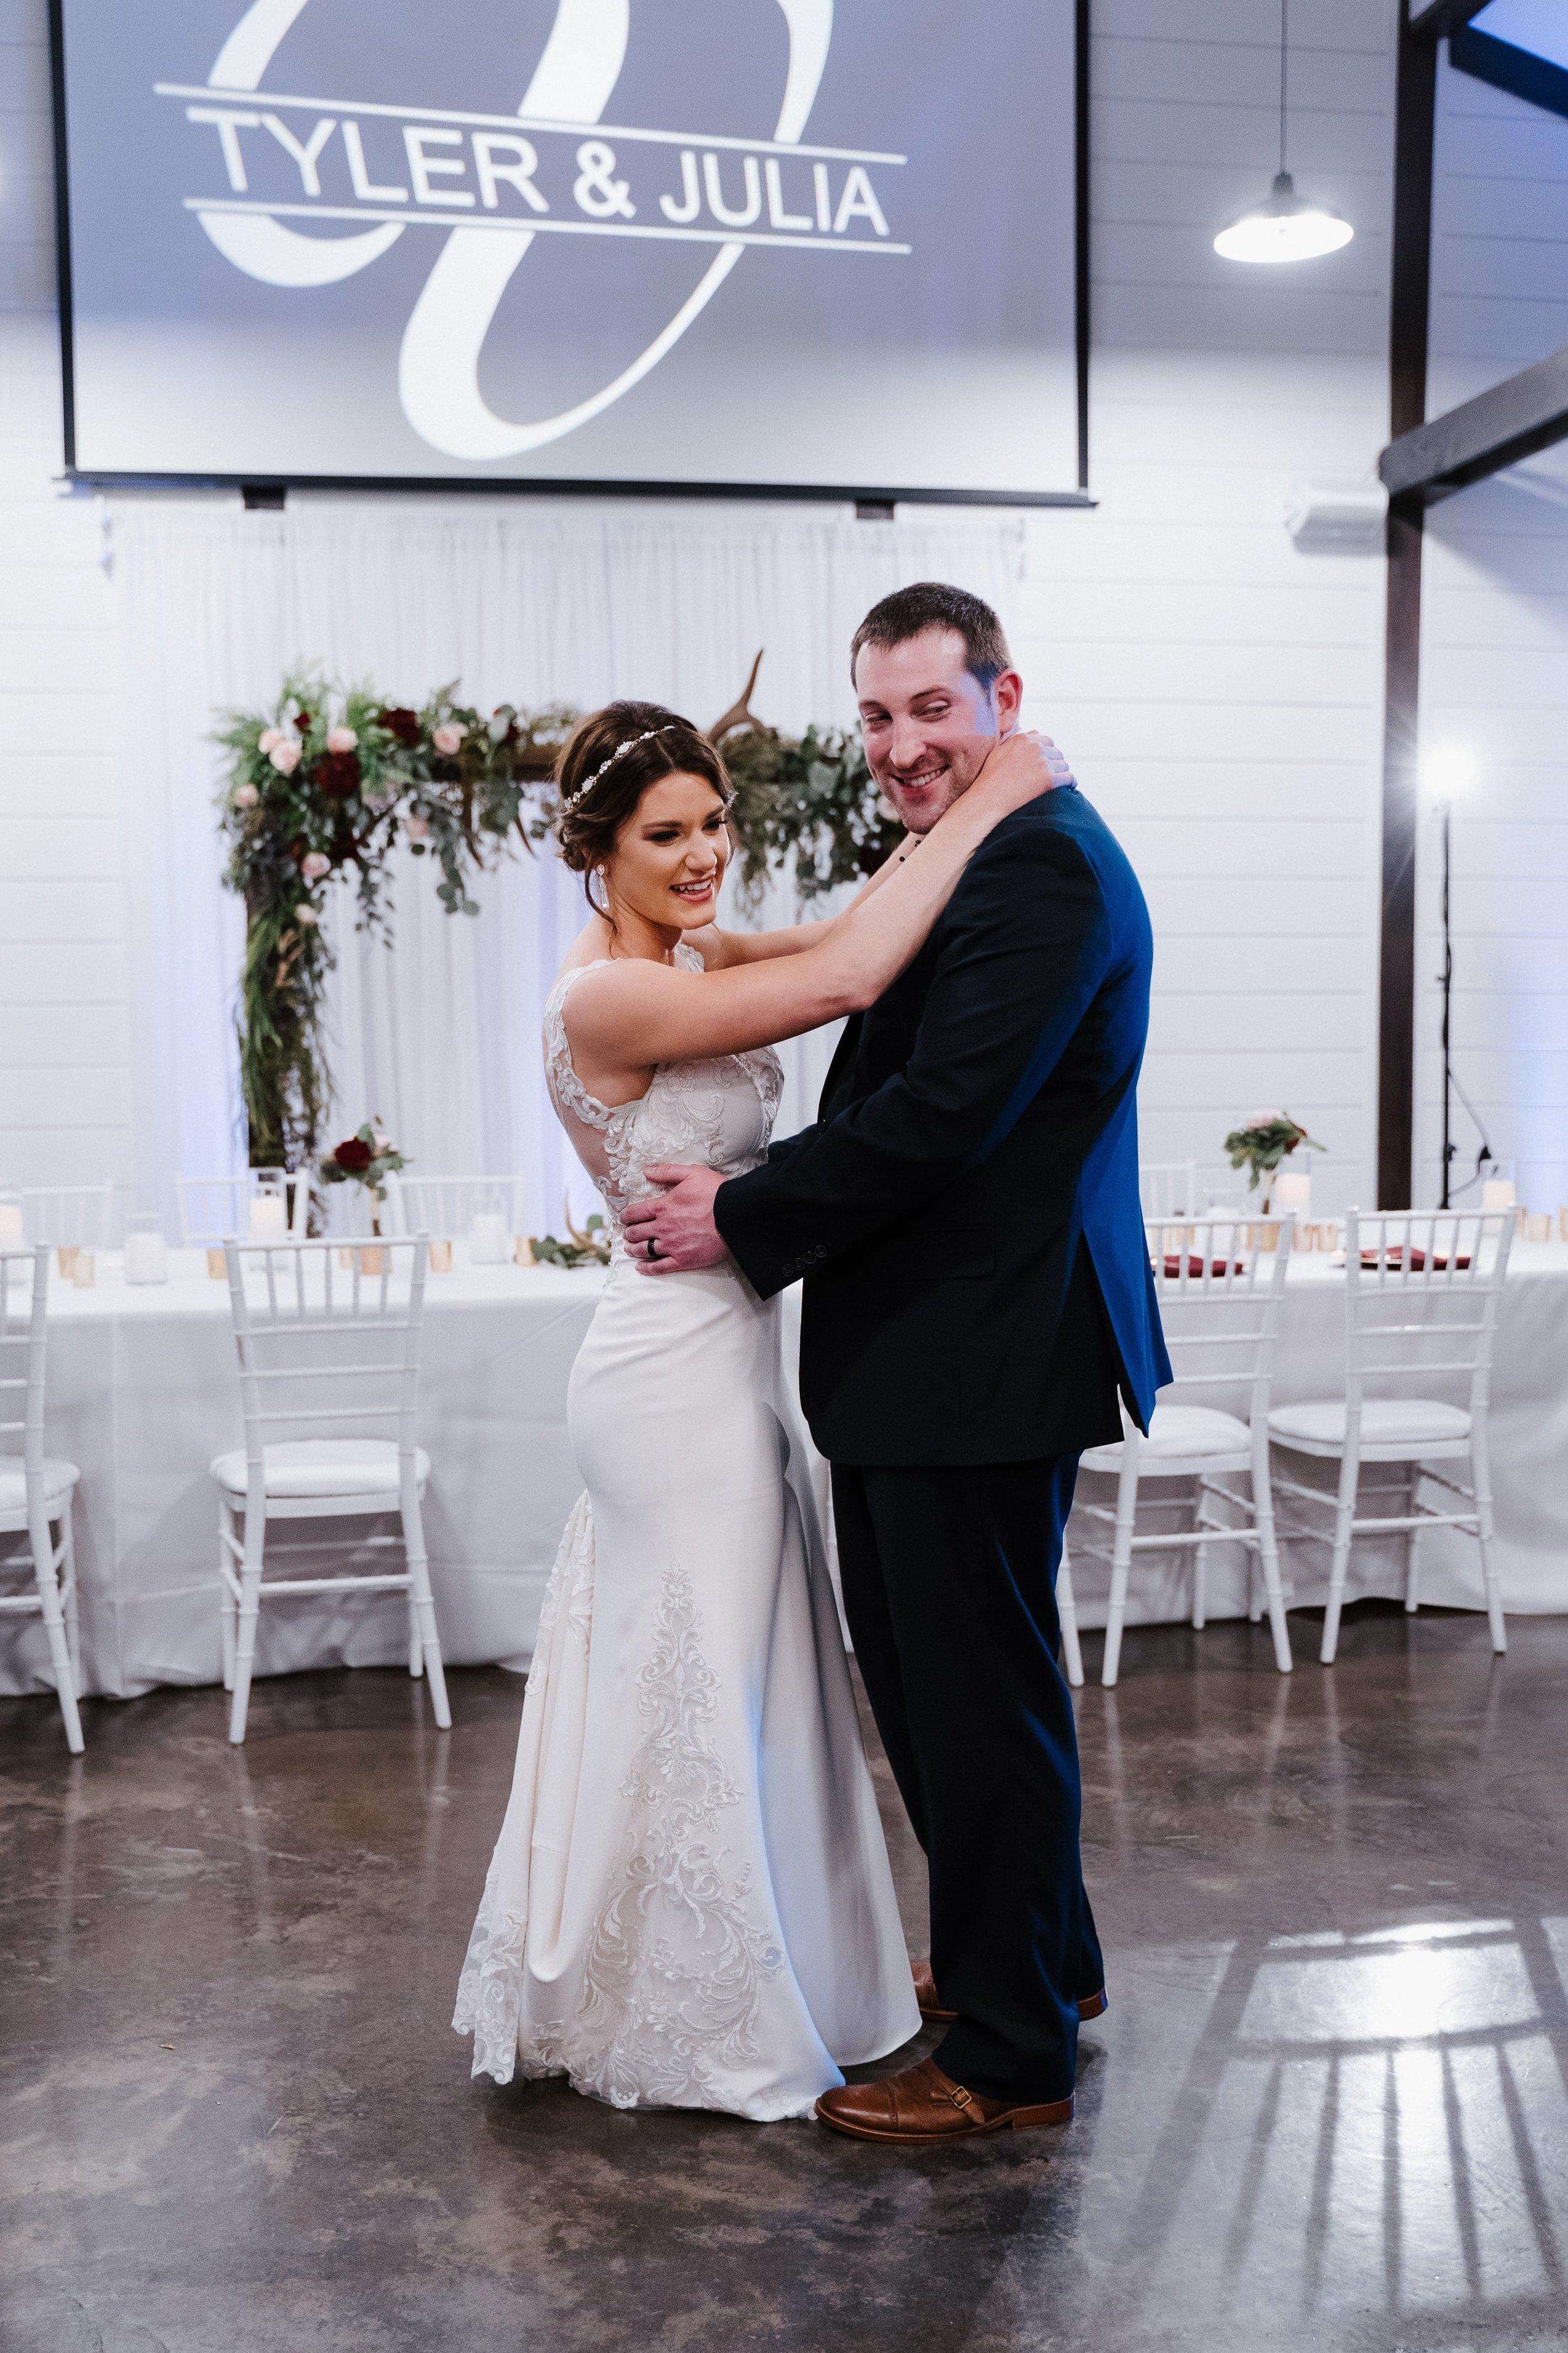 Tulsa Wedding Venues White Barn 37.jpg